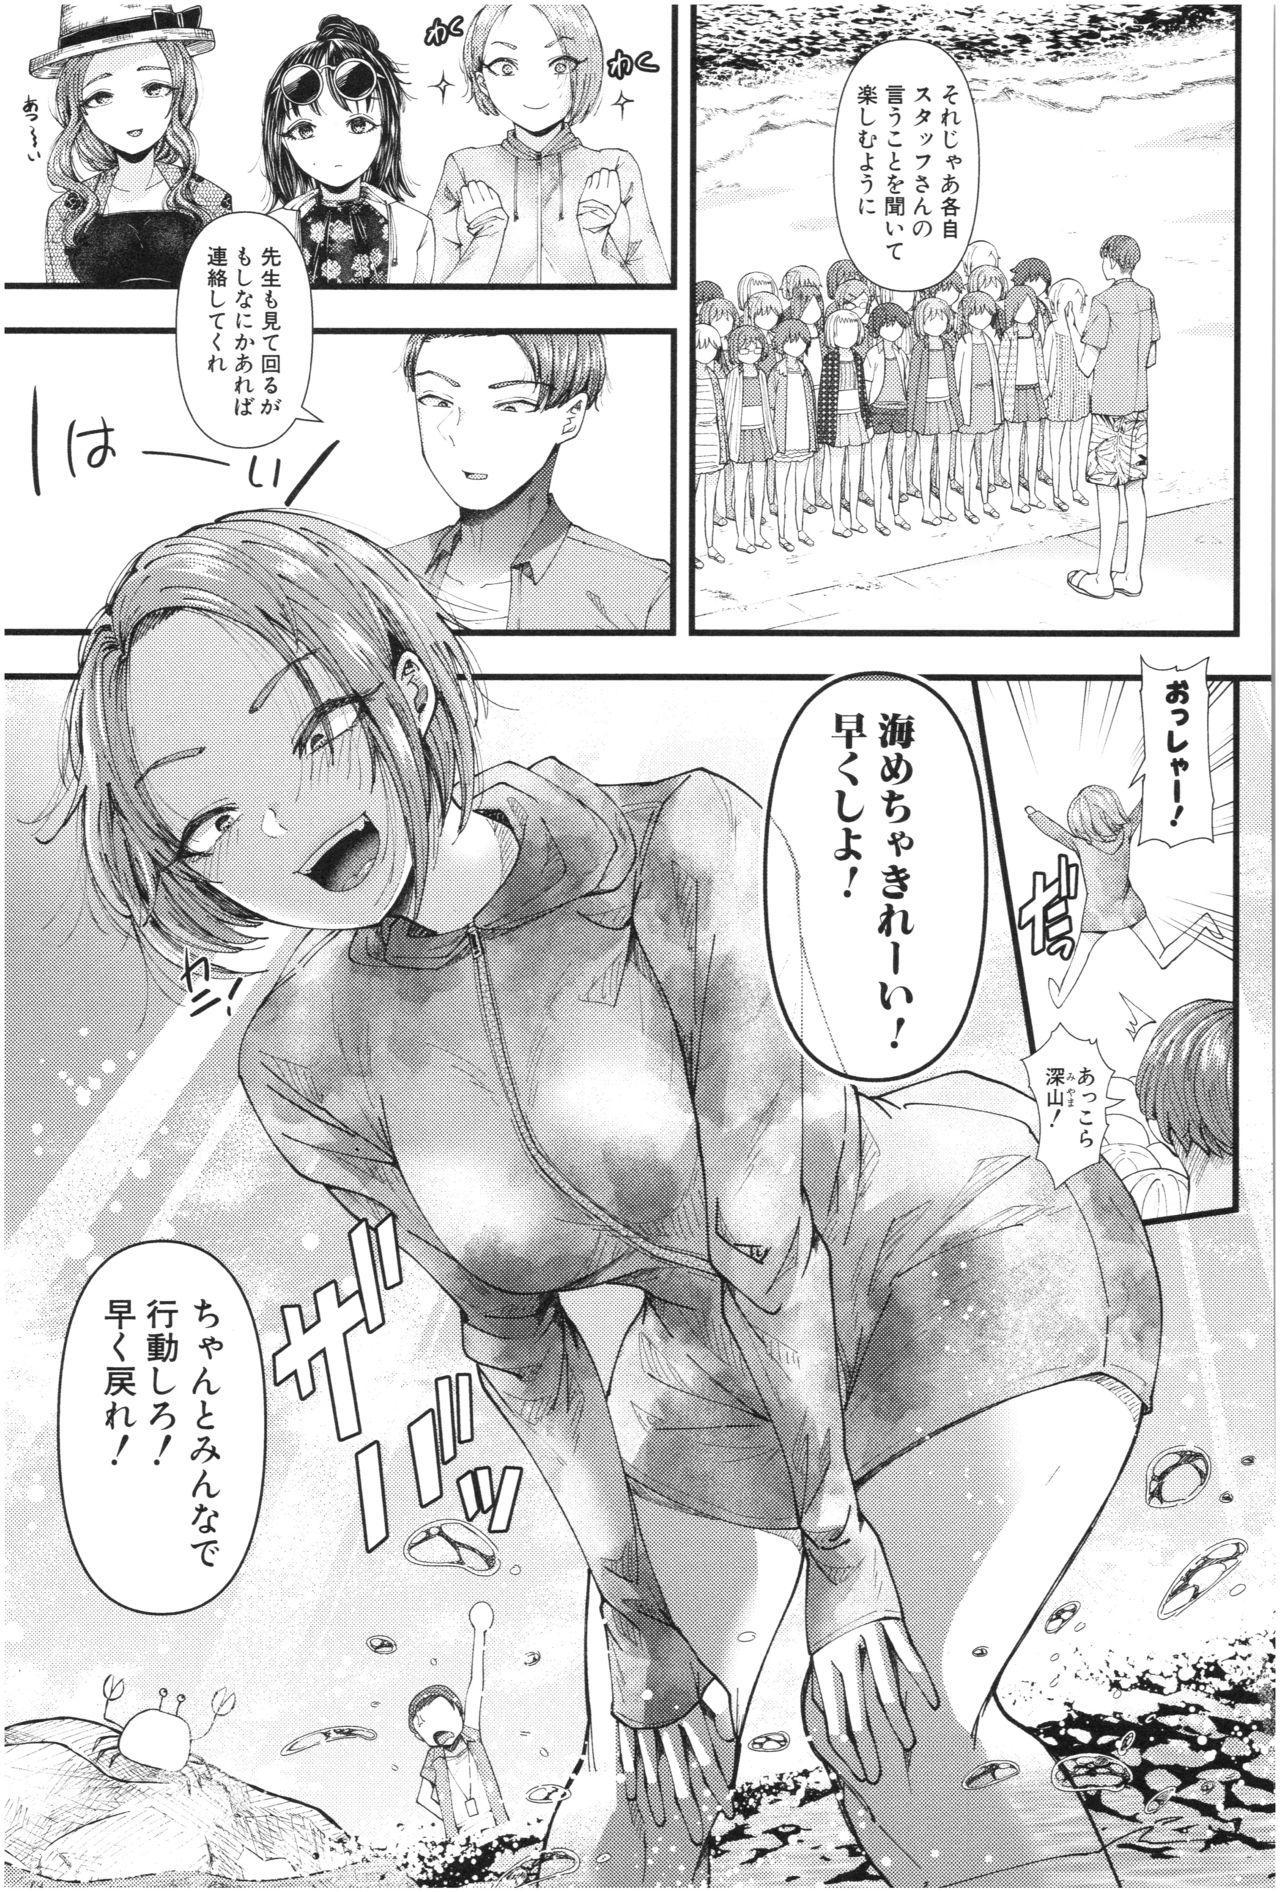 Sannenkan no Aoi Haru 67